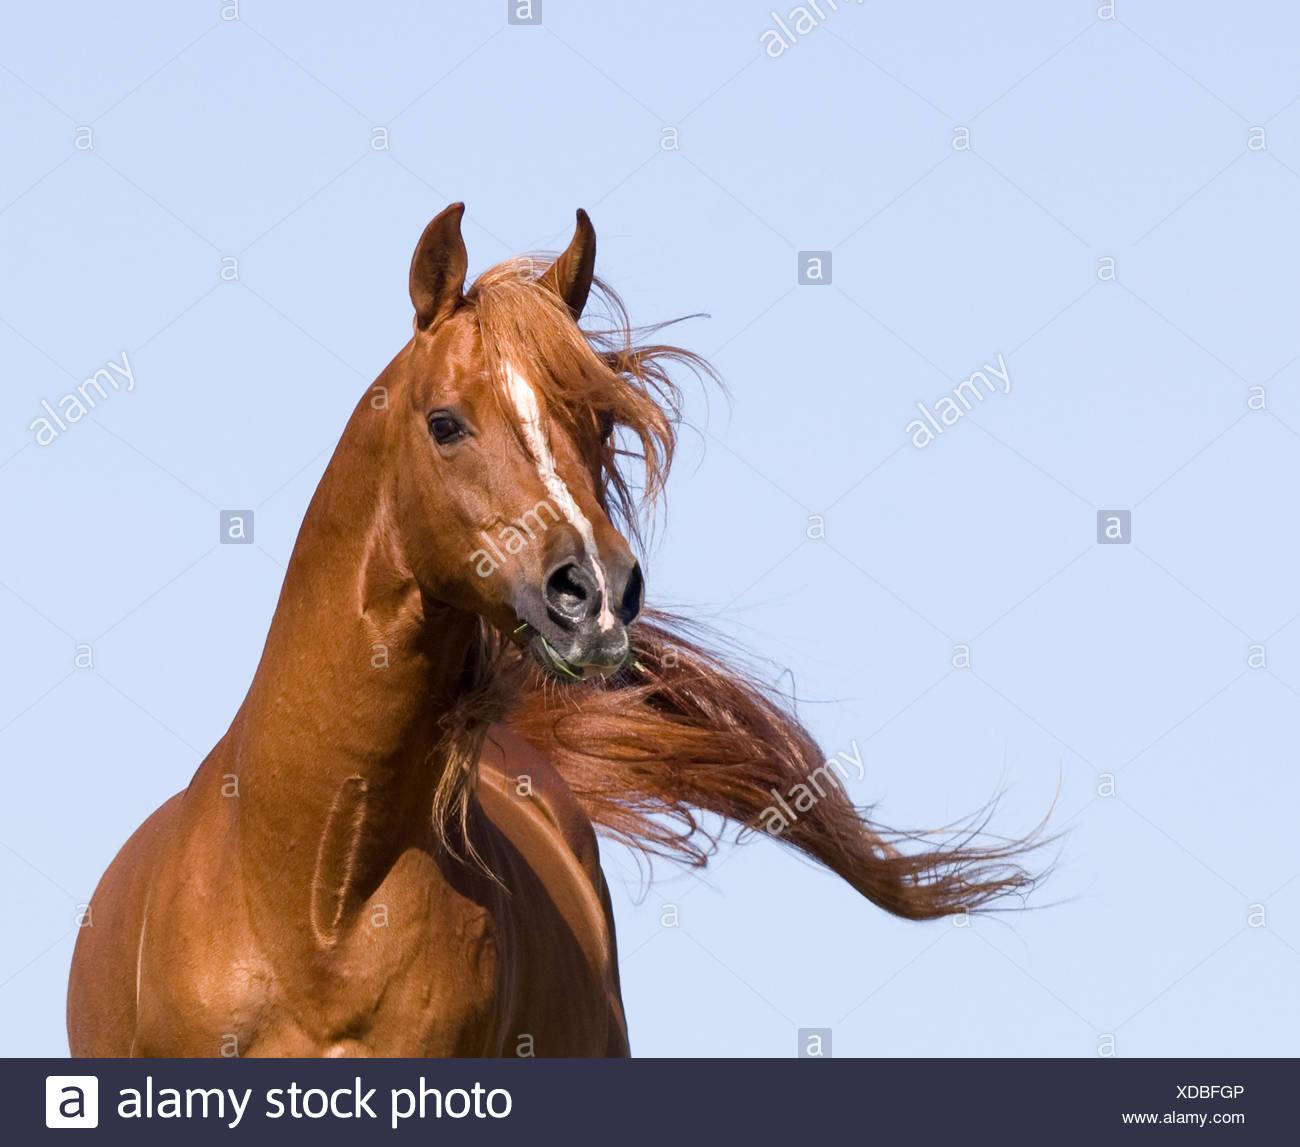 Chestnut arabian stallion running, California, USA - Stock Image